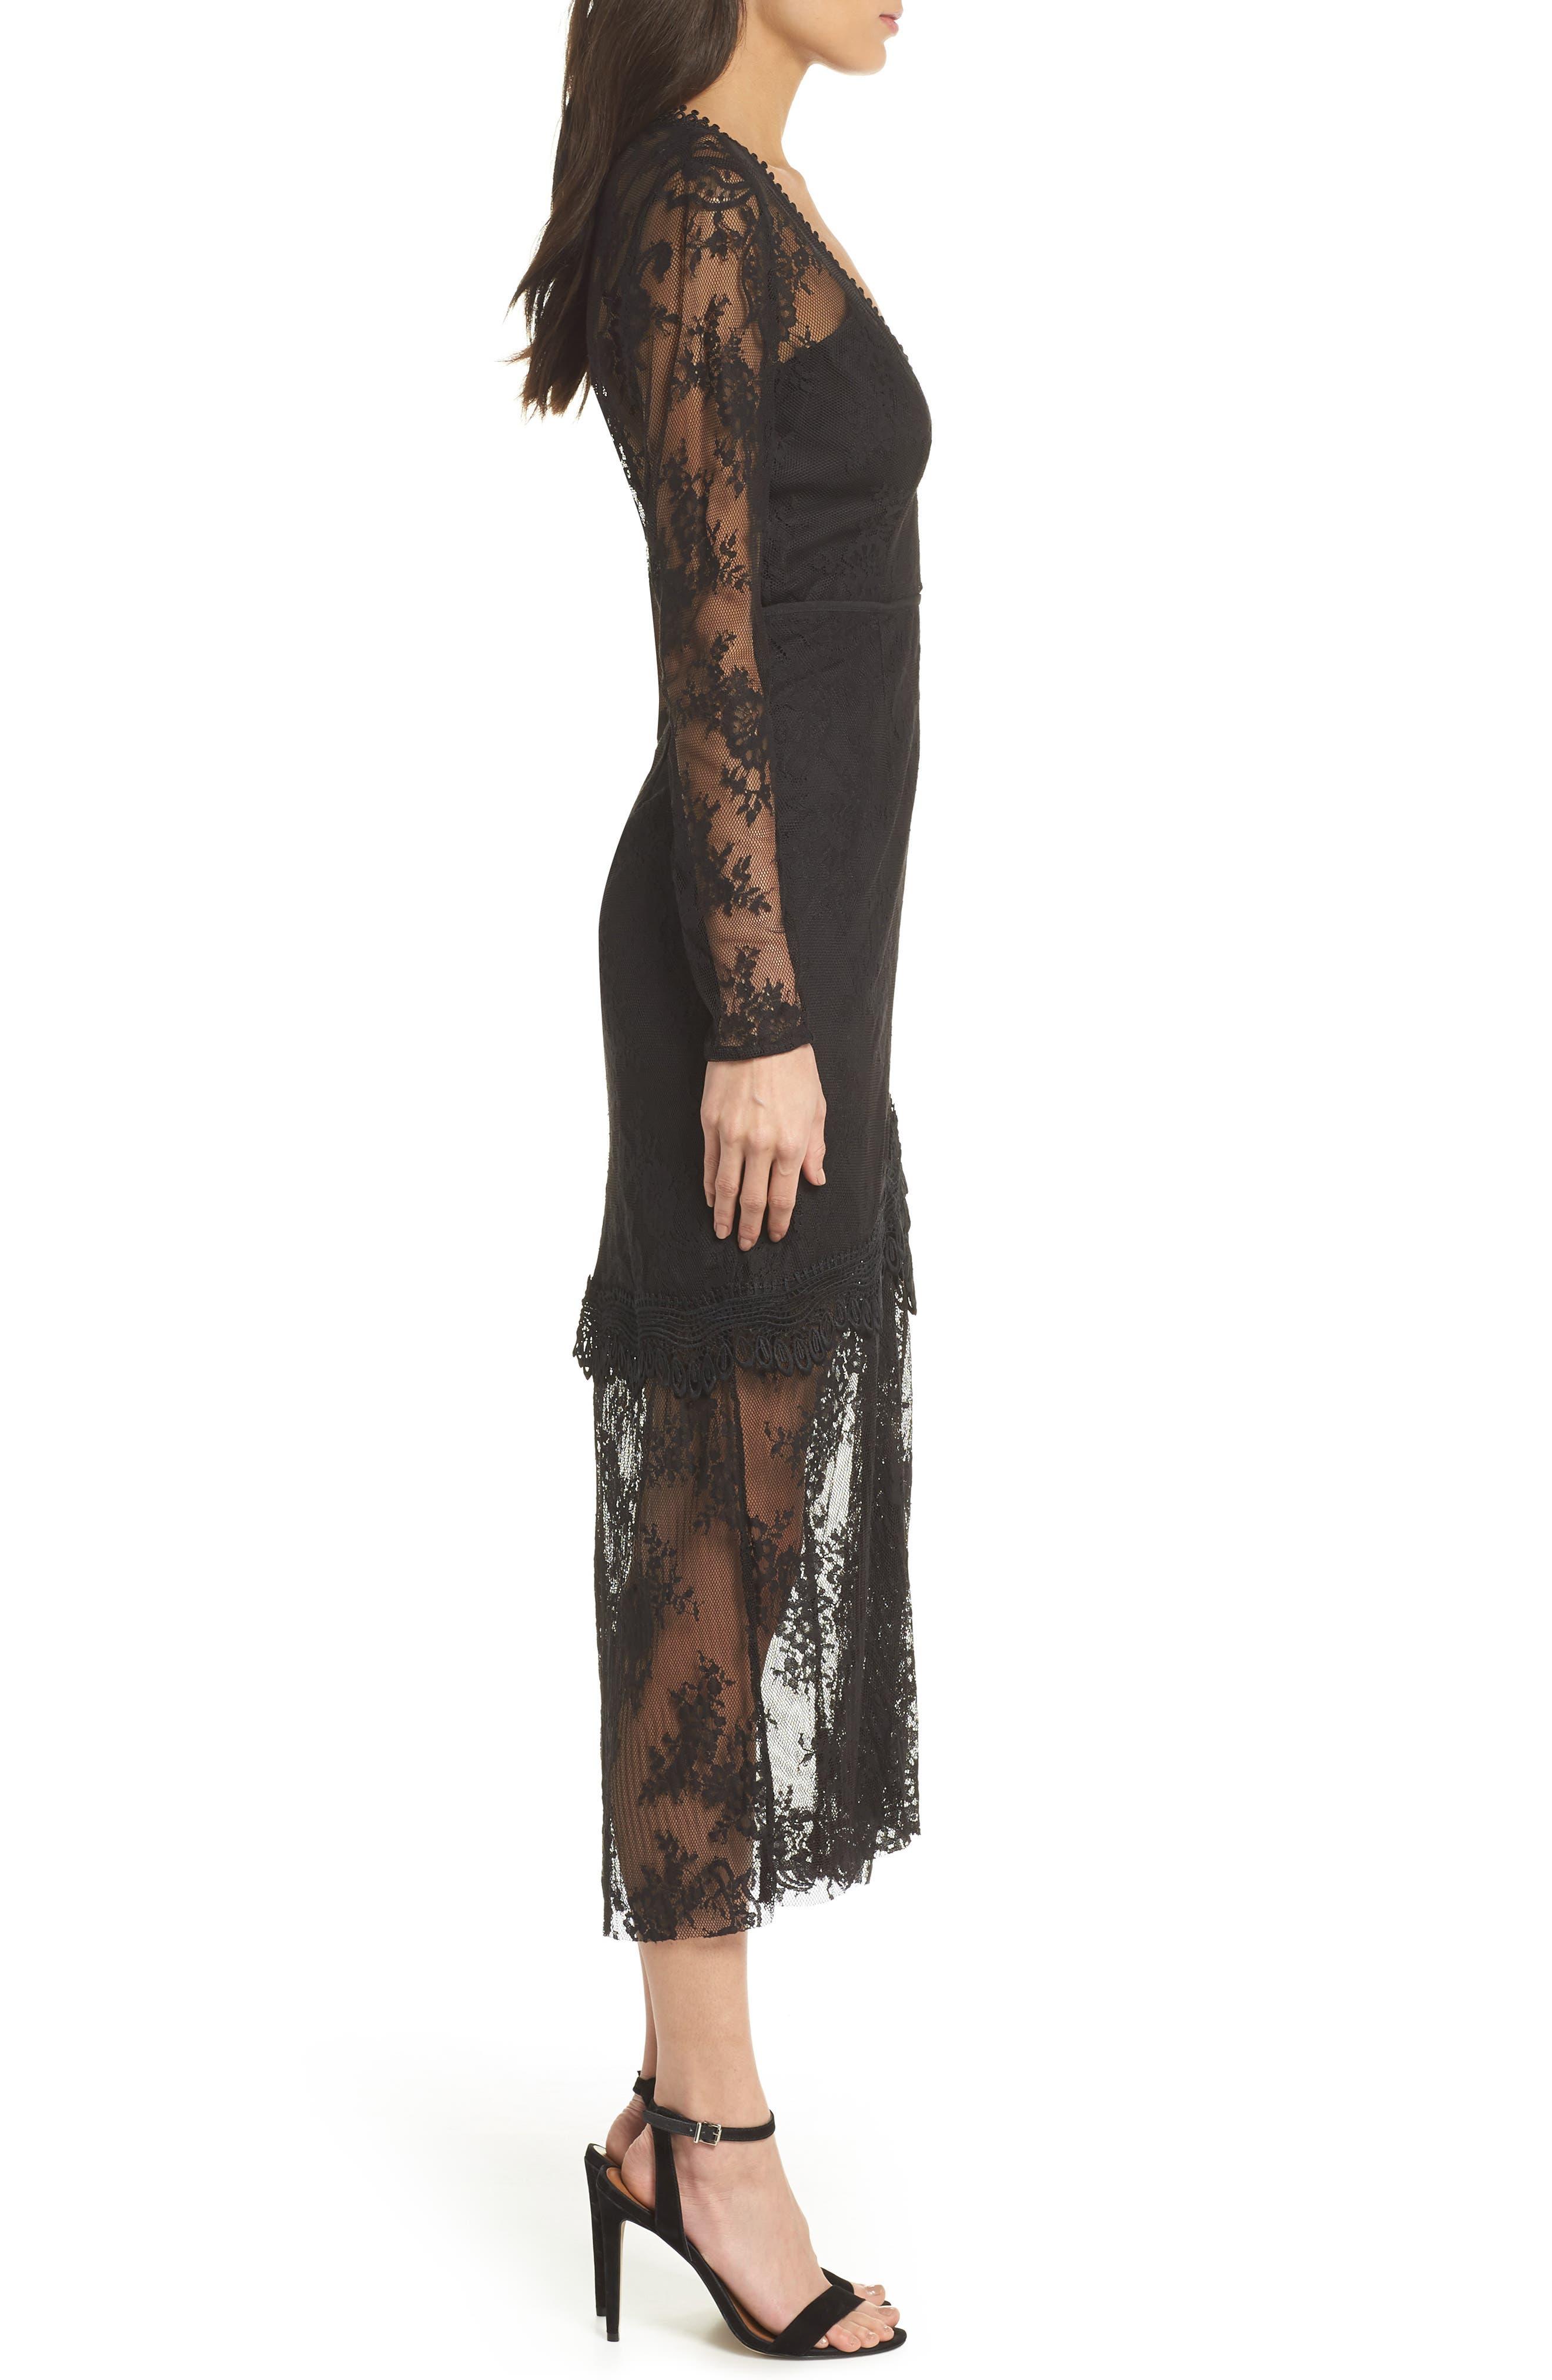 True Chemistry Lace Sheath Dress,                             Alternate thumbnail 3, color,                             Black